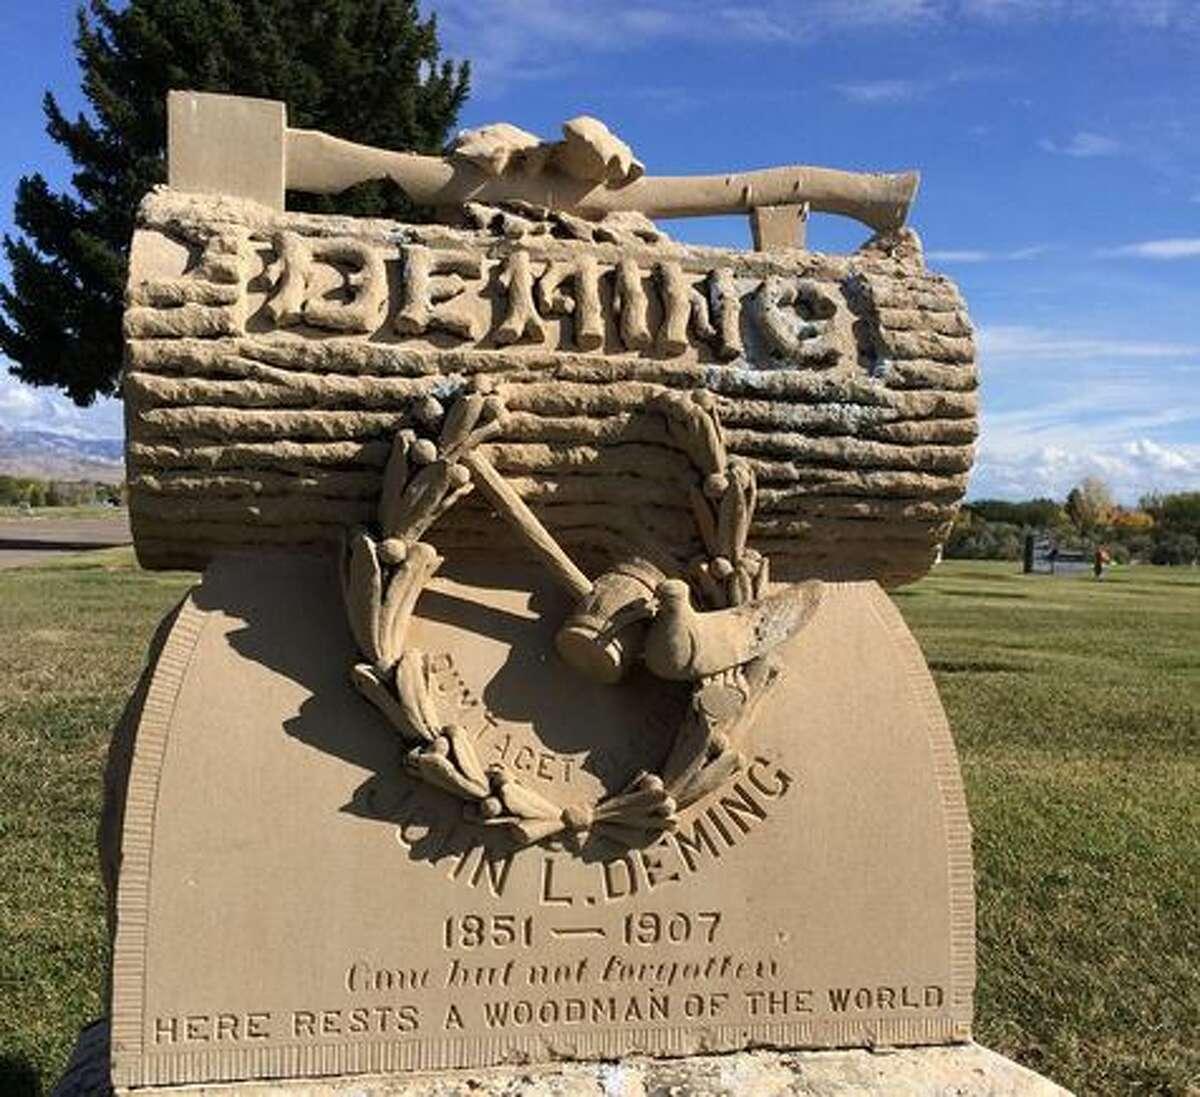 Woodmen of the World gravestone in Vernal, Utah.